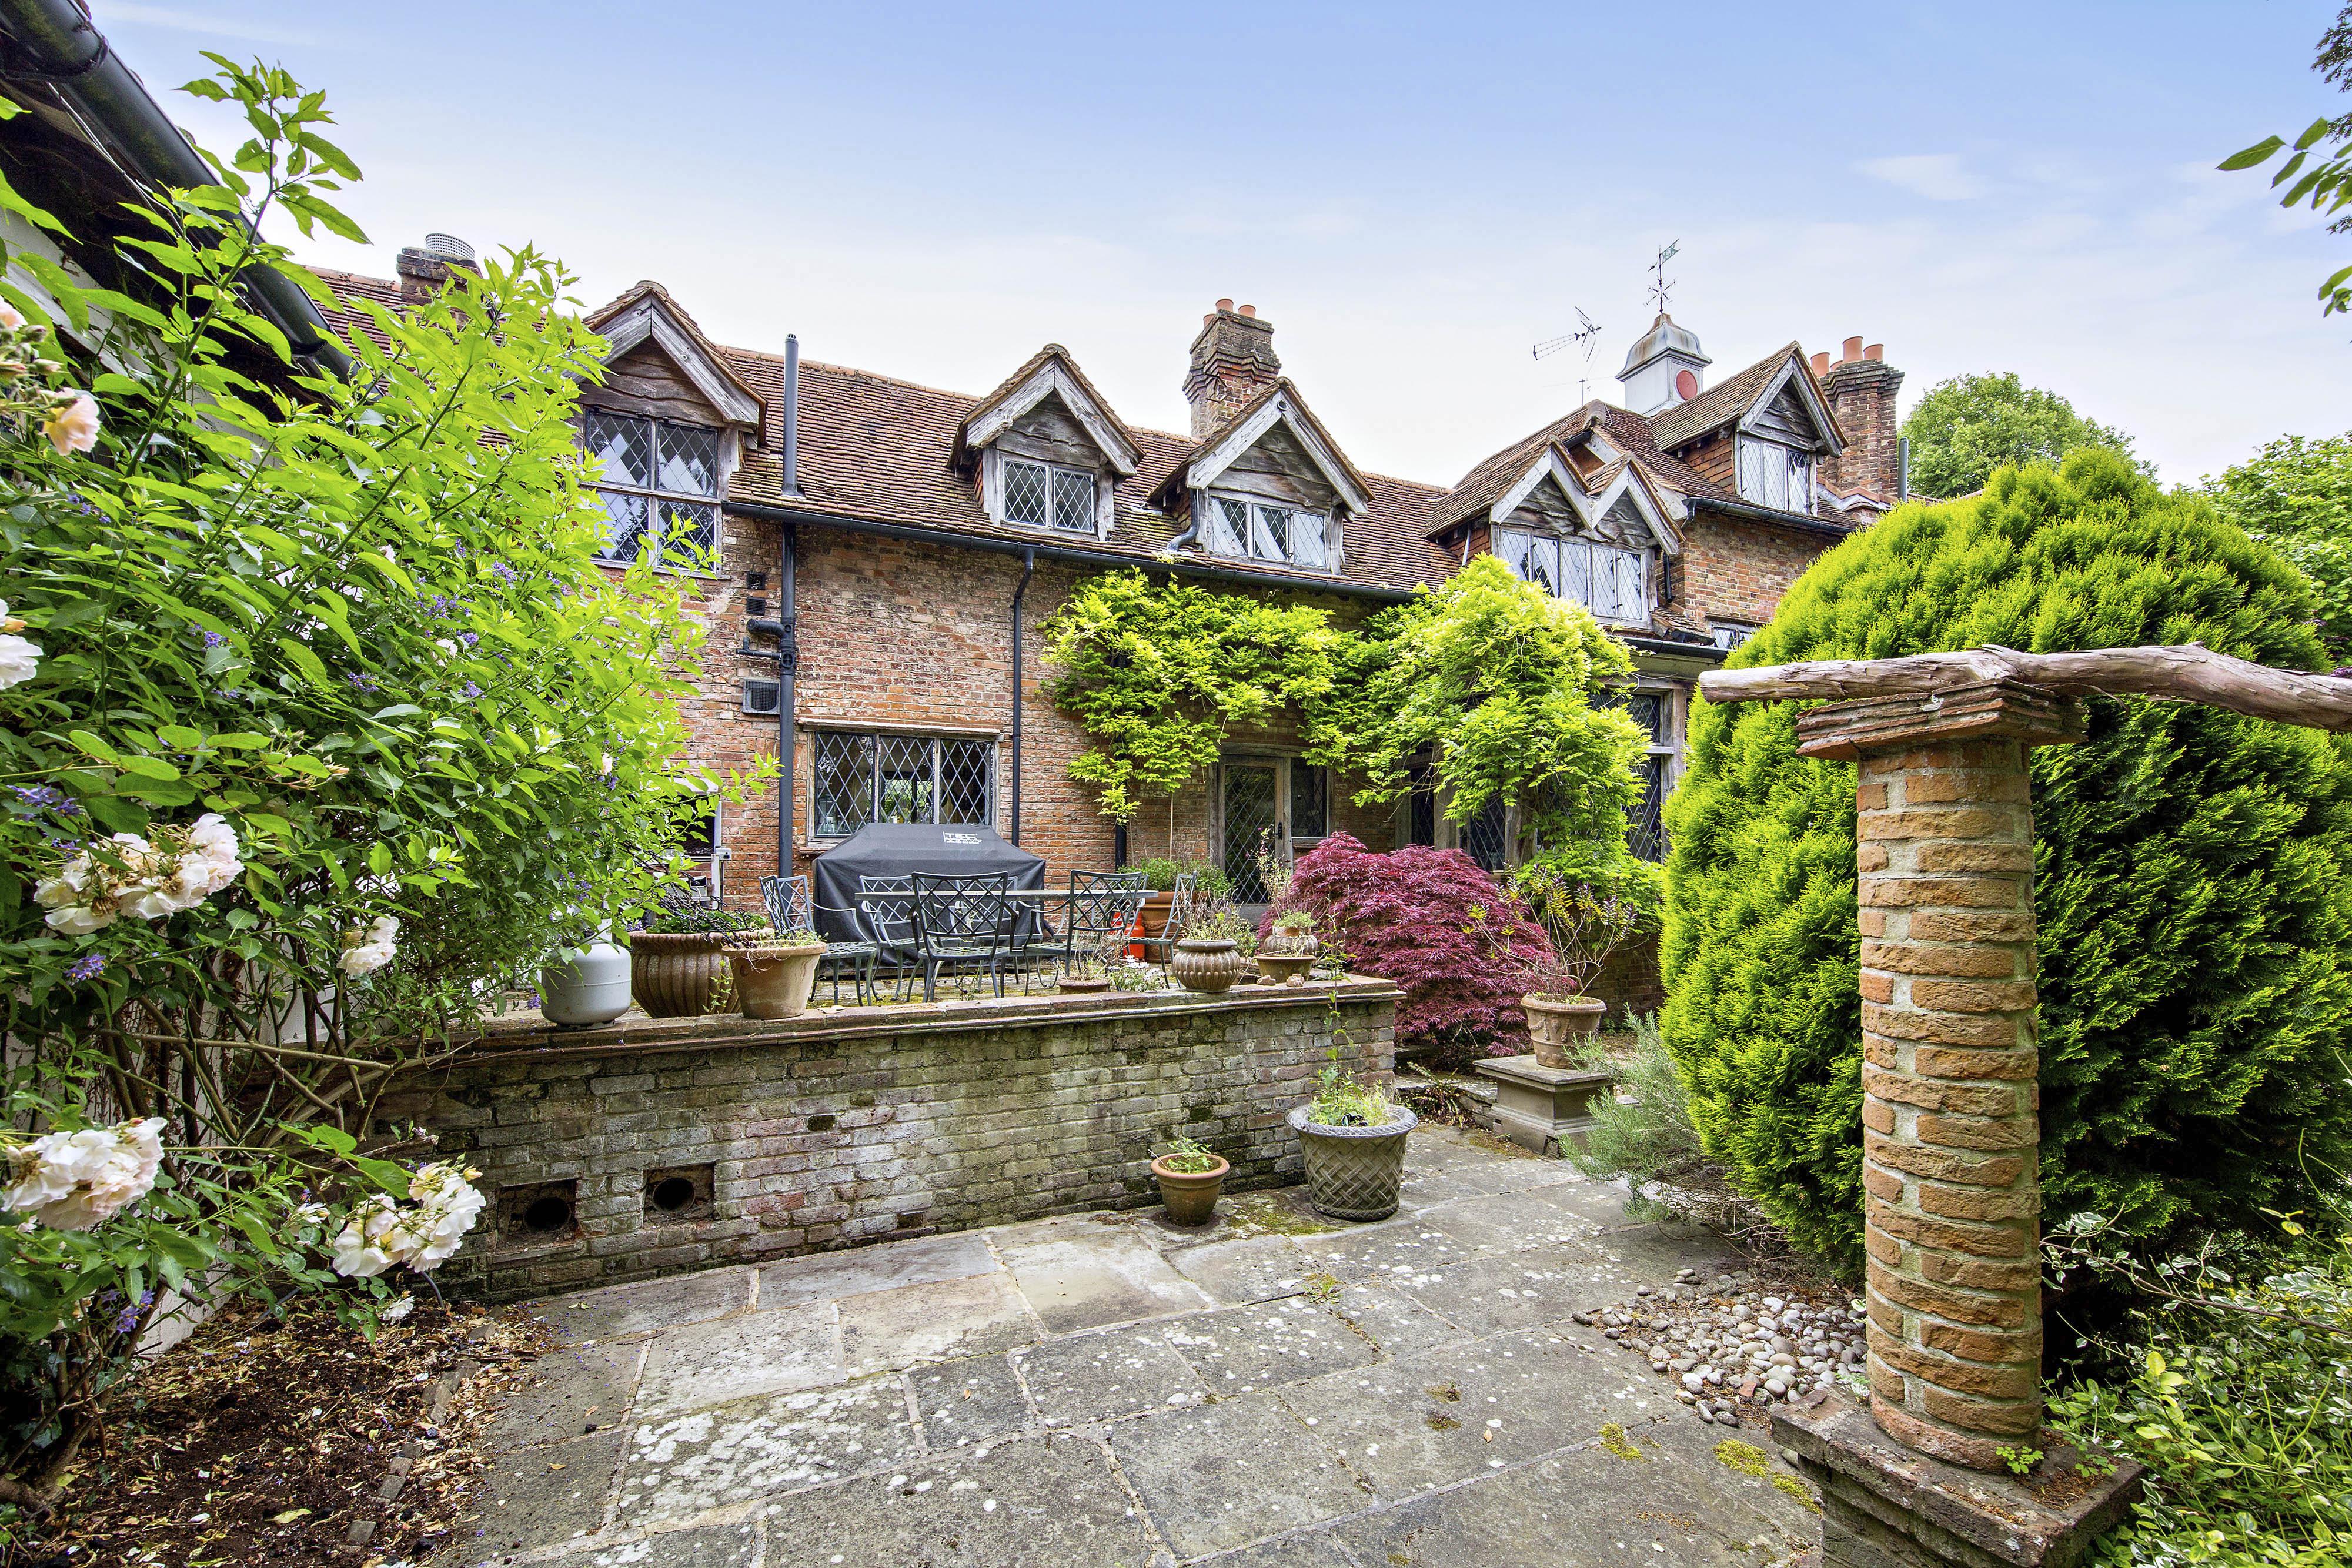 Tek Ailelik Ev için Satış at Country Living Givons Grove Other England, Ingiltere KT228LD Ingiltere